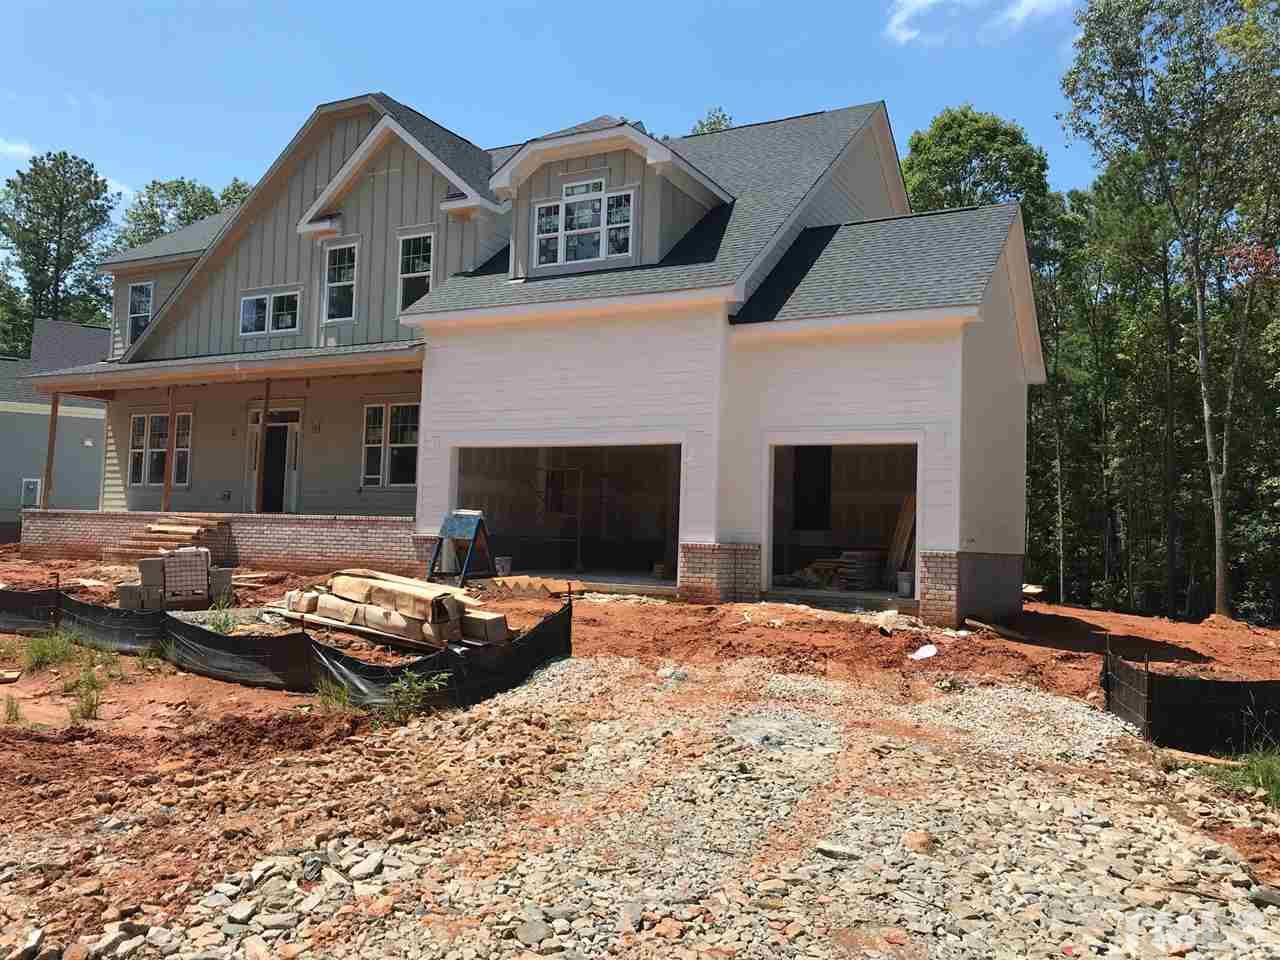 REO (Foreclosed), HUD and VA homes in Wake County, NC